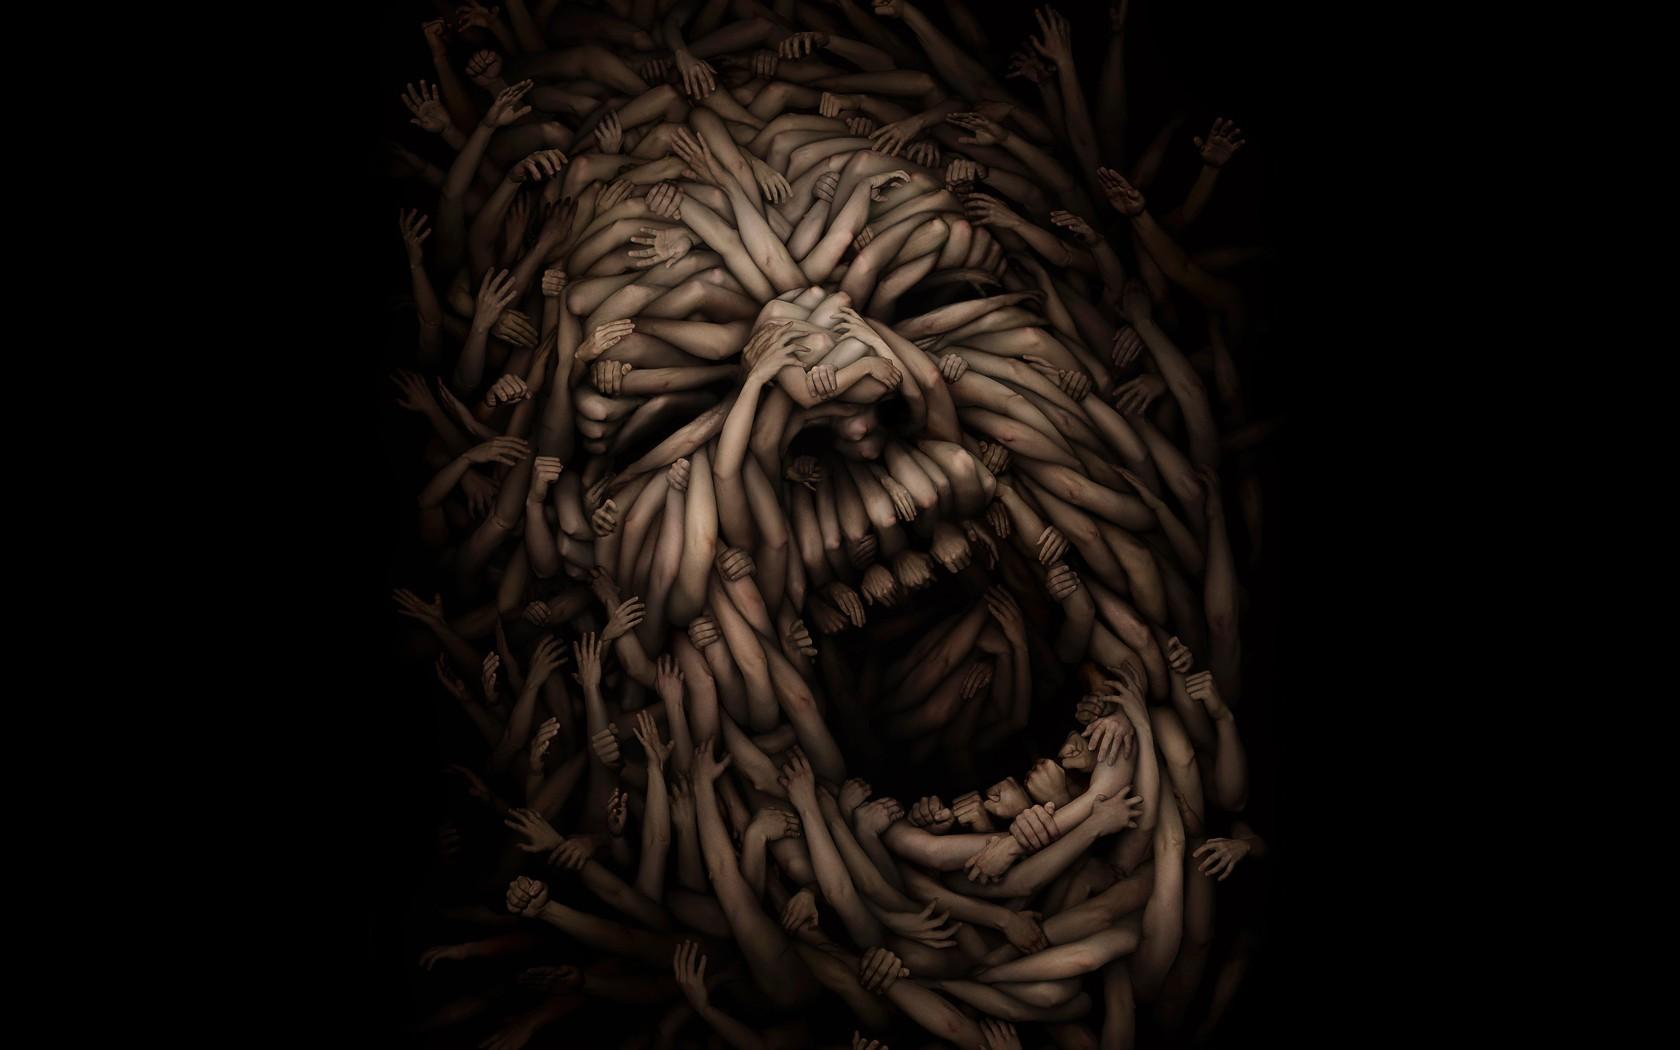 Wallpaper : Face, Hands, Horror, Artwork, Tiger, Sculpture